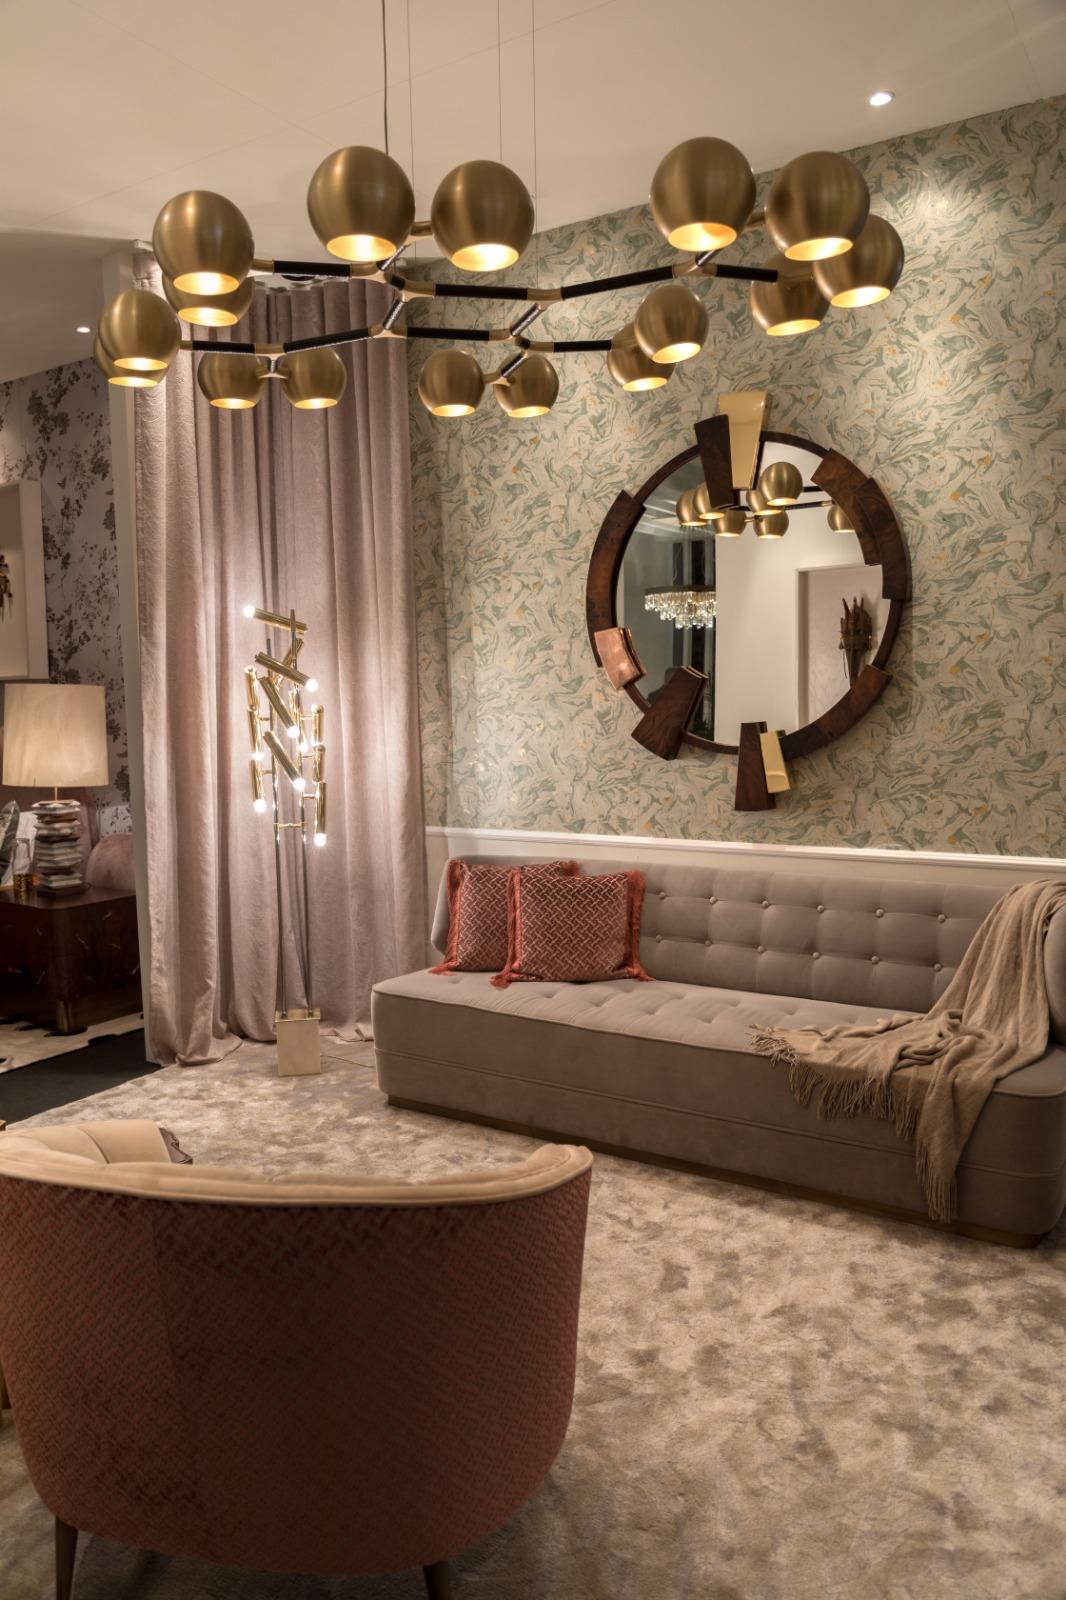 maison et objet 2019 Maison et Objet 2019: BRABBU Upholstery Fabrics in Paris George Sofa